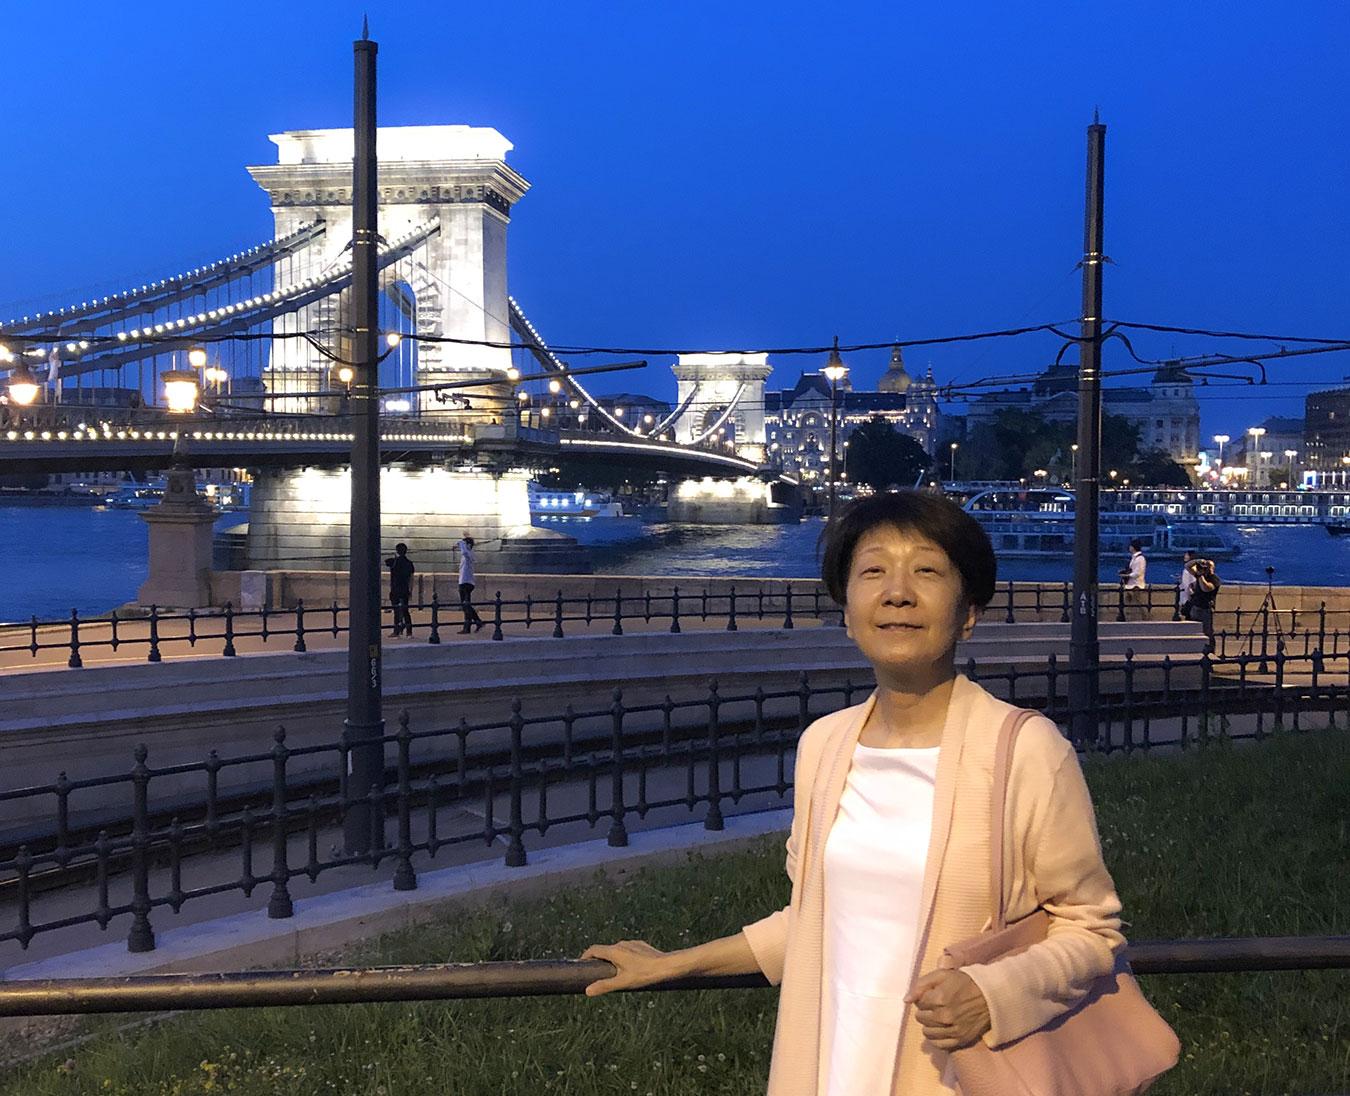 jp-sato-kuni-budapest-chain-bridge-web.jpg